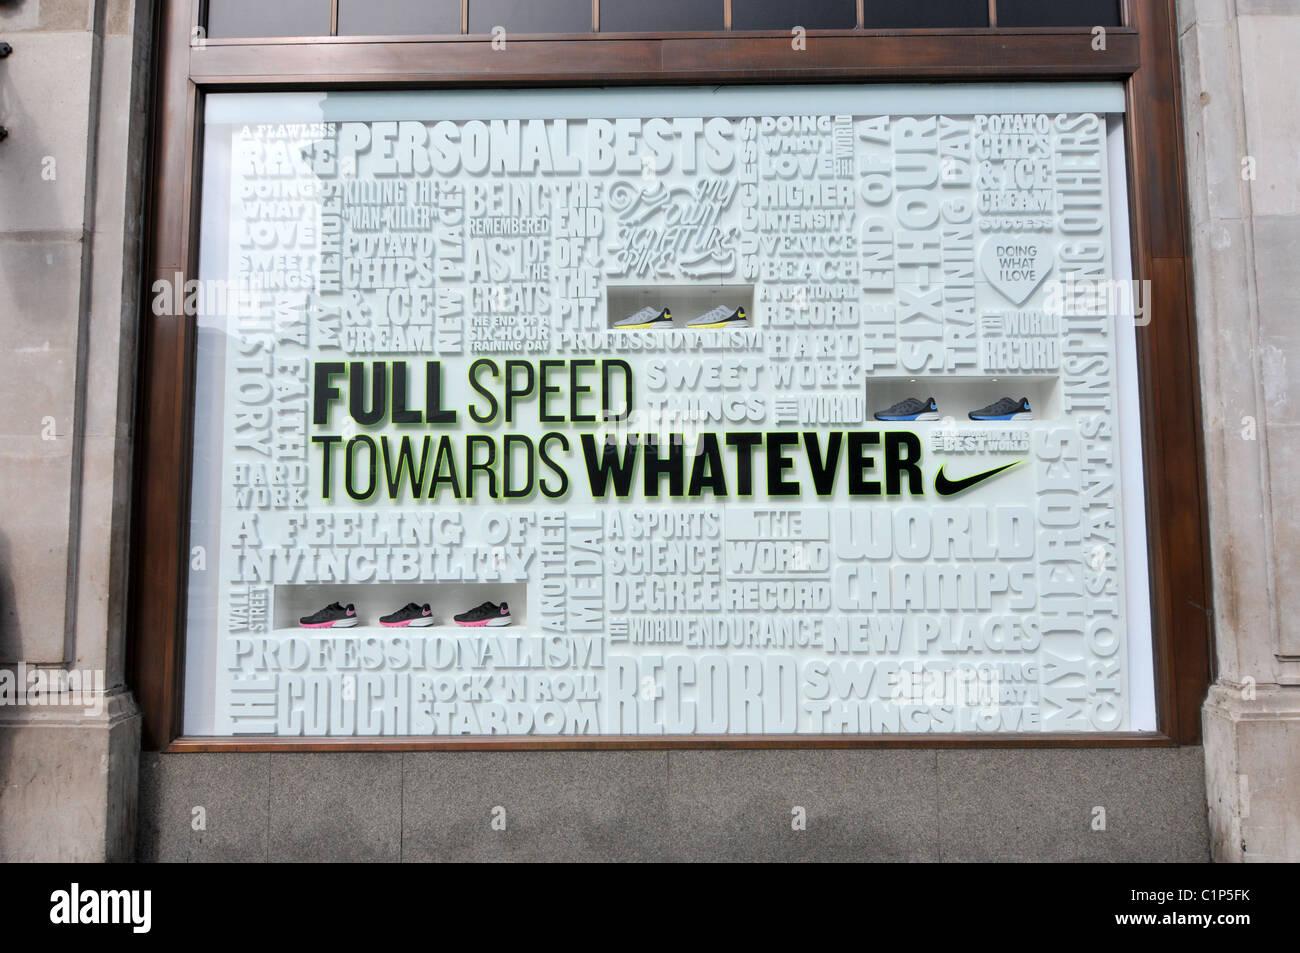 Nike Store Oxford Circus Advert Shop Window Display Slogan Full Speed Towards Whatever